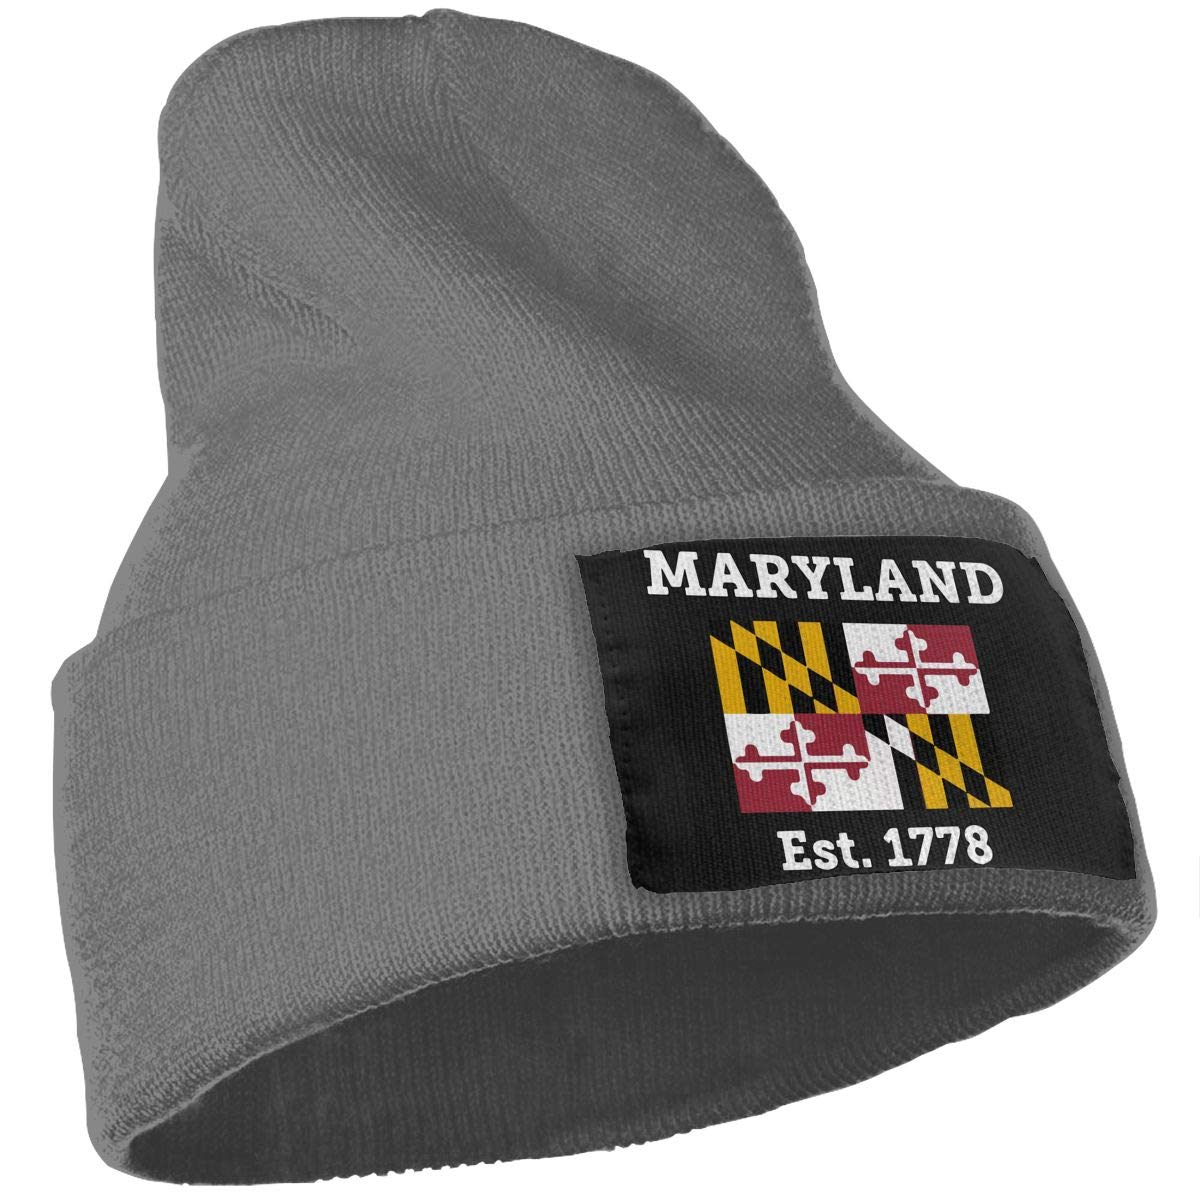 Girl Power Heart Soft Beanie Hat WHOO93@Y Mens Womens 100/% Acrylic Knit Hat Cap